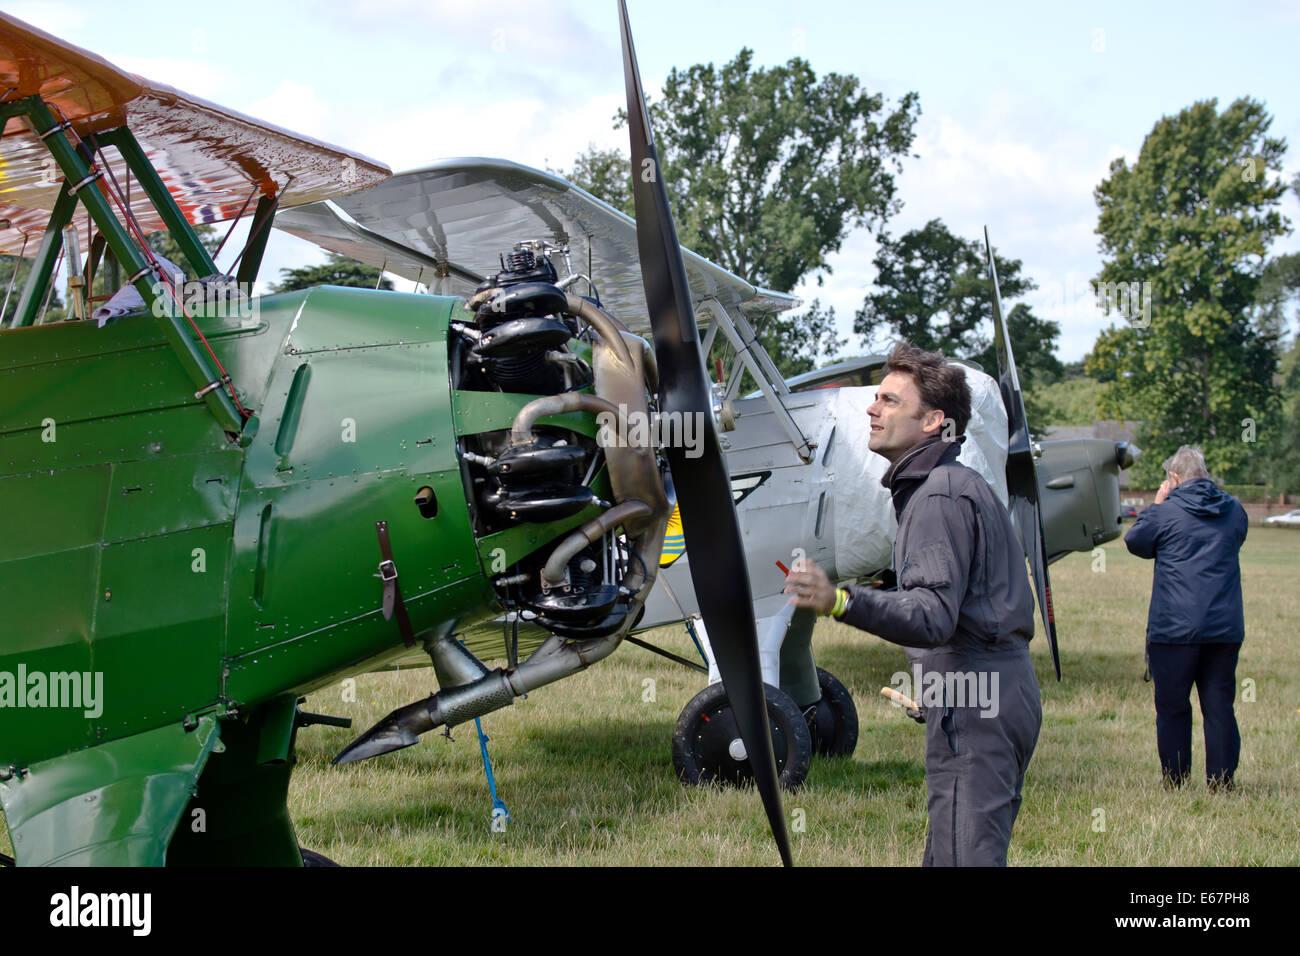 29th international Moth Rally at Woburn Abbey UK.The pilot of the Focke-Wulf Fw-44J Stieglitz prepares his plane. - Stock Image